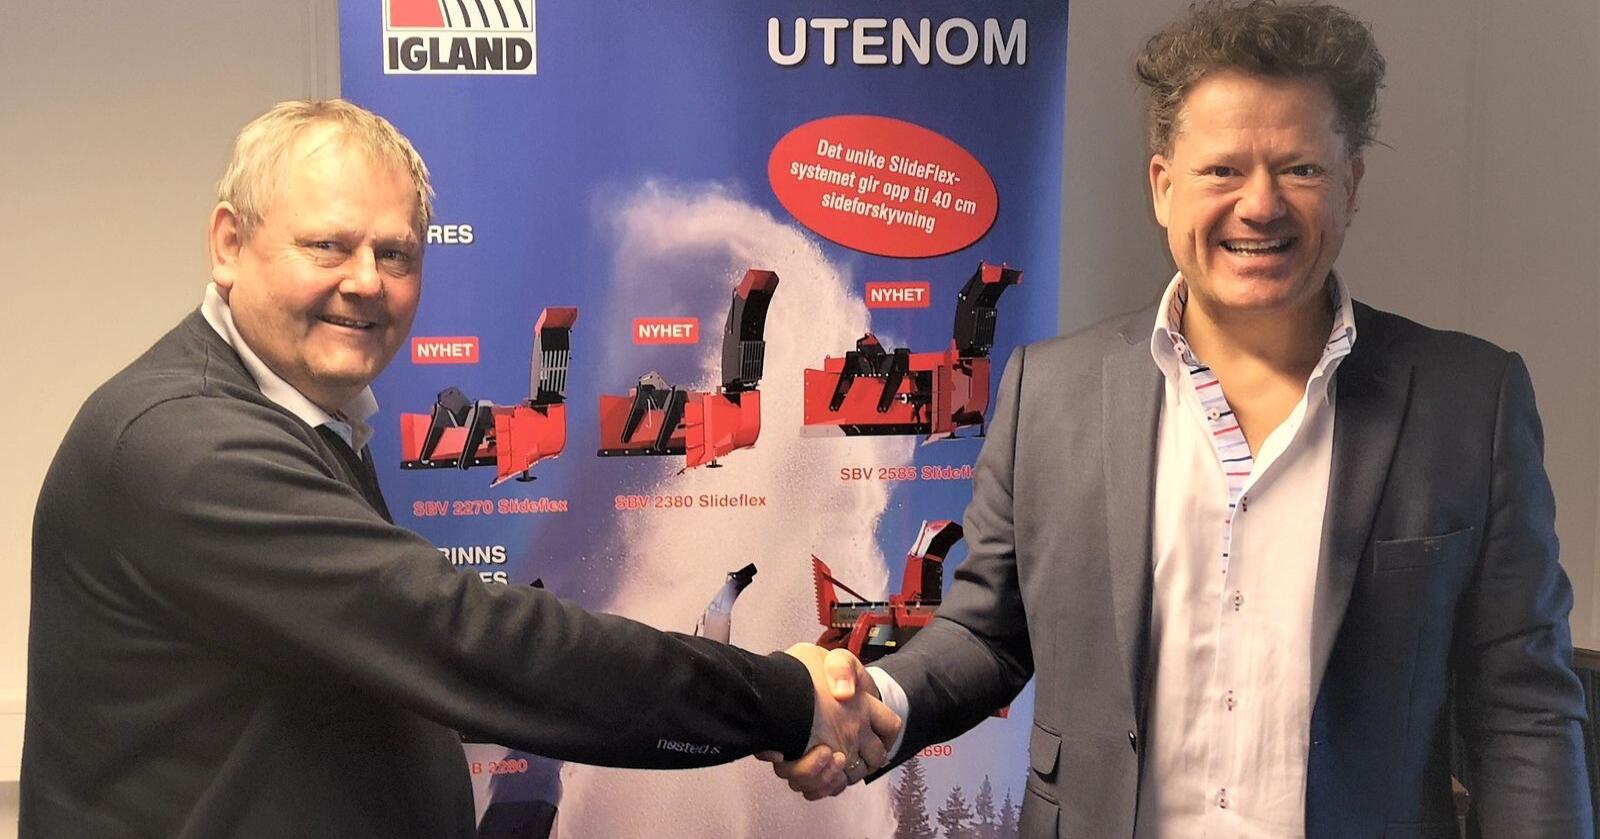 Salgs- og produktsjef for Igland i Nøsted&, Olaf Lindtveit (til venstre) og administrerende direktør i A-K maskiner, Erik Grefberg (til høyre), er fornøyde med at A-K nå blir eksklusiv fohandler av Iglands produktportefølje fra Nøsted&